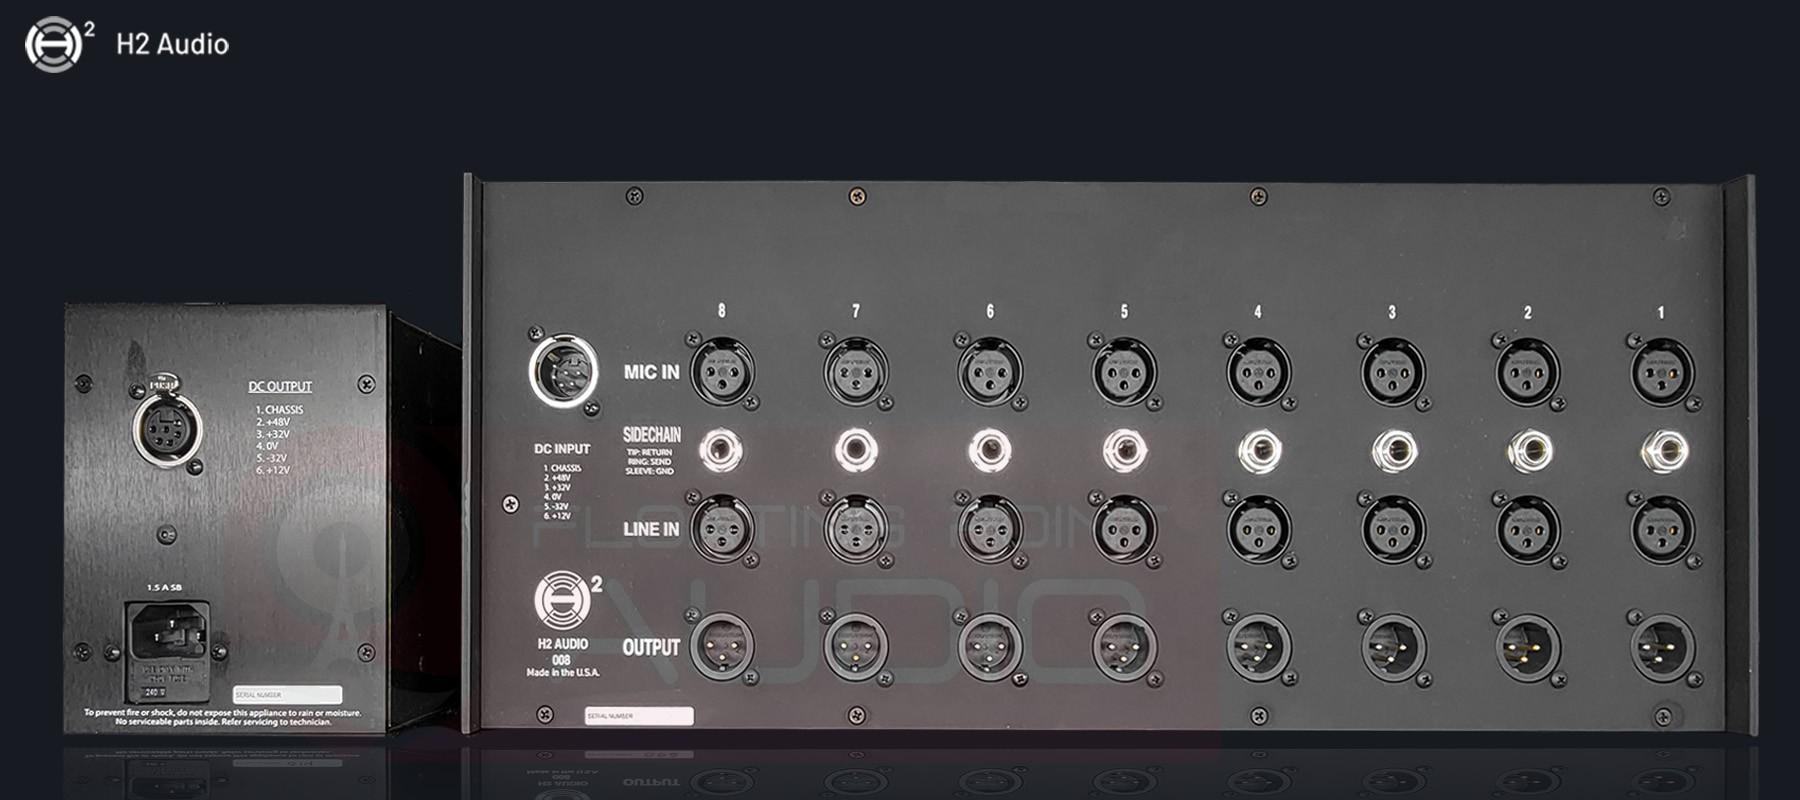 H2 Audio 008 Rack - Back